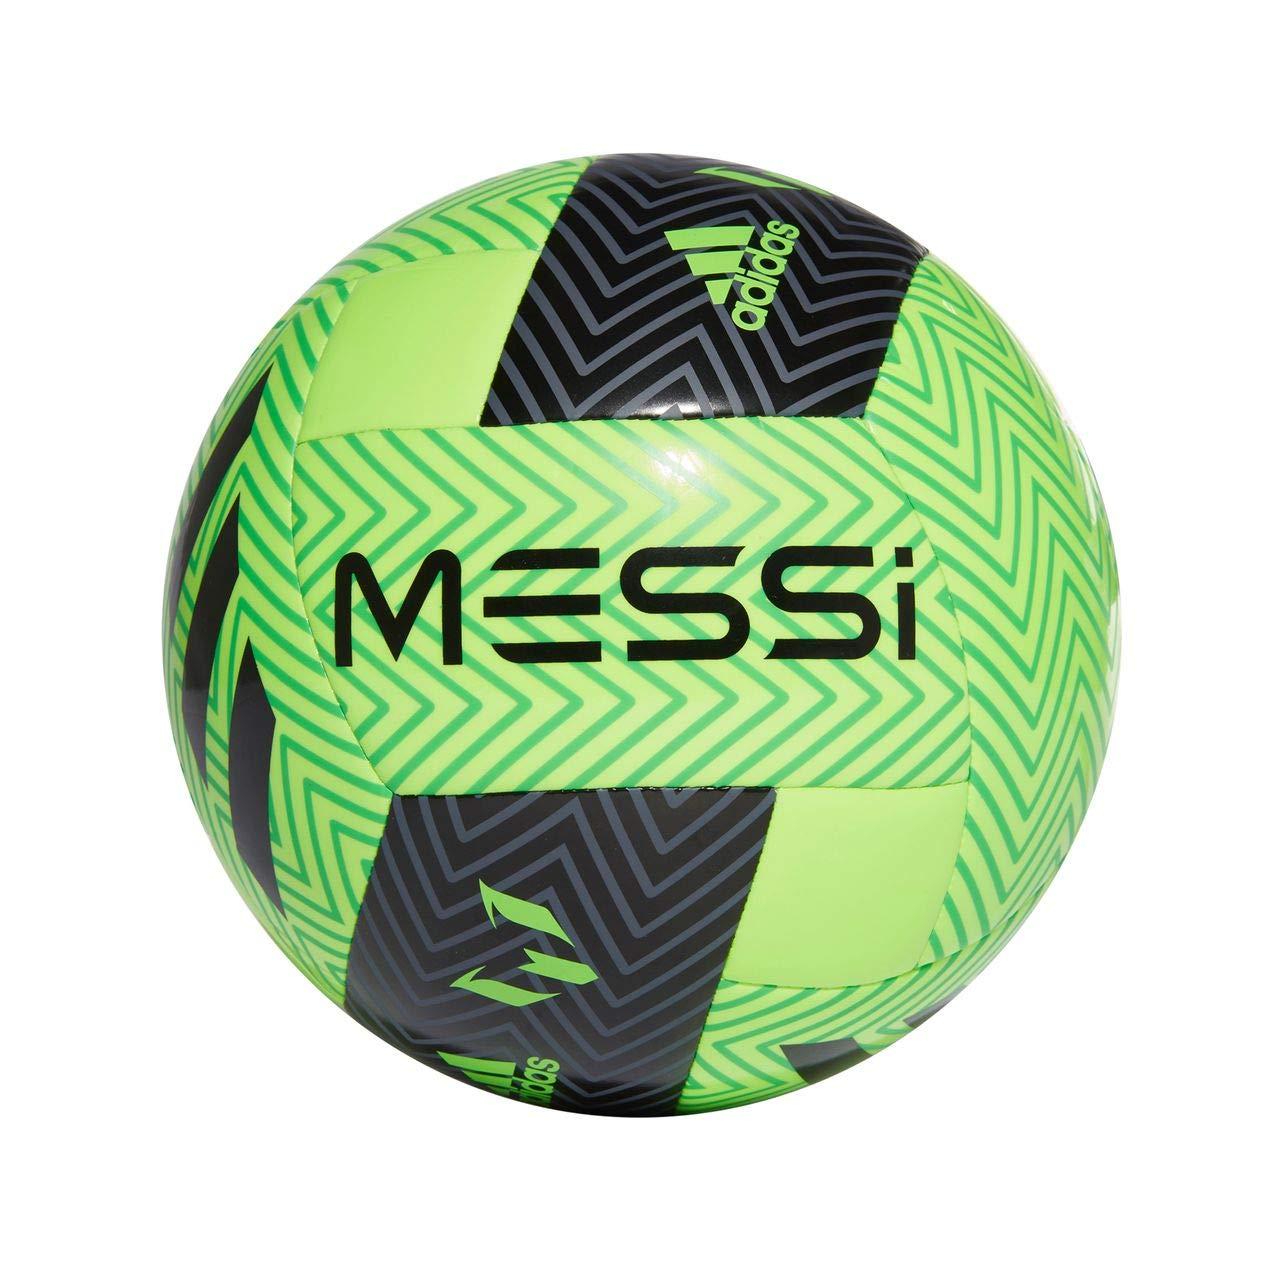 Adidas Messi Q3 Football (Green/Black, 5) (B07DGHYLYM) Amazon Price History, Amazon Price Tracker